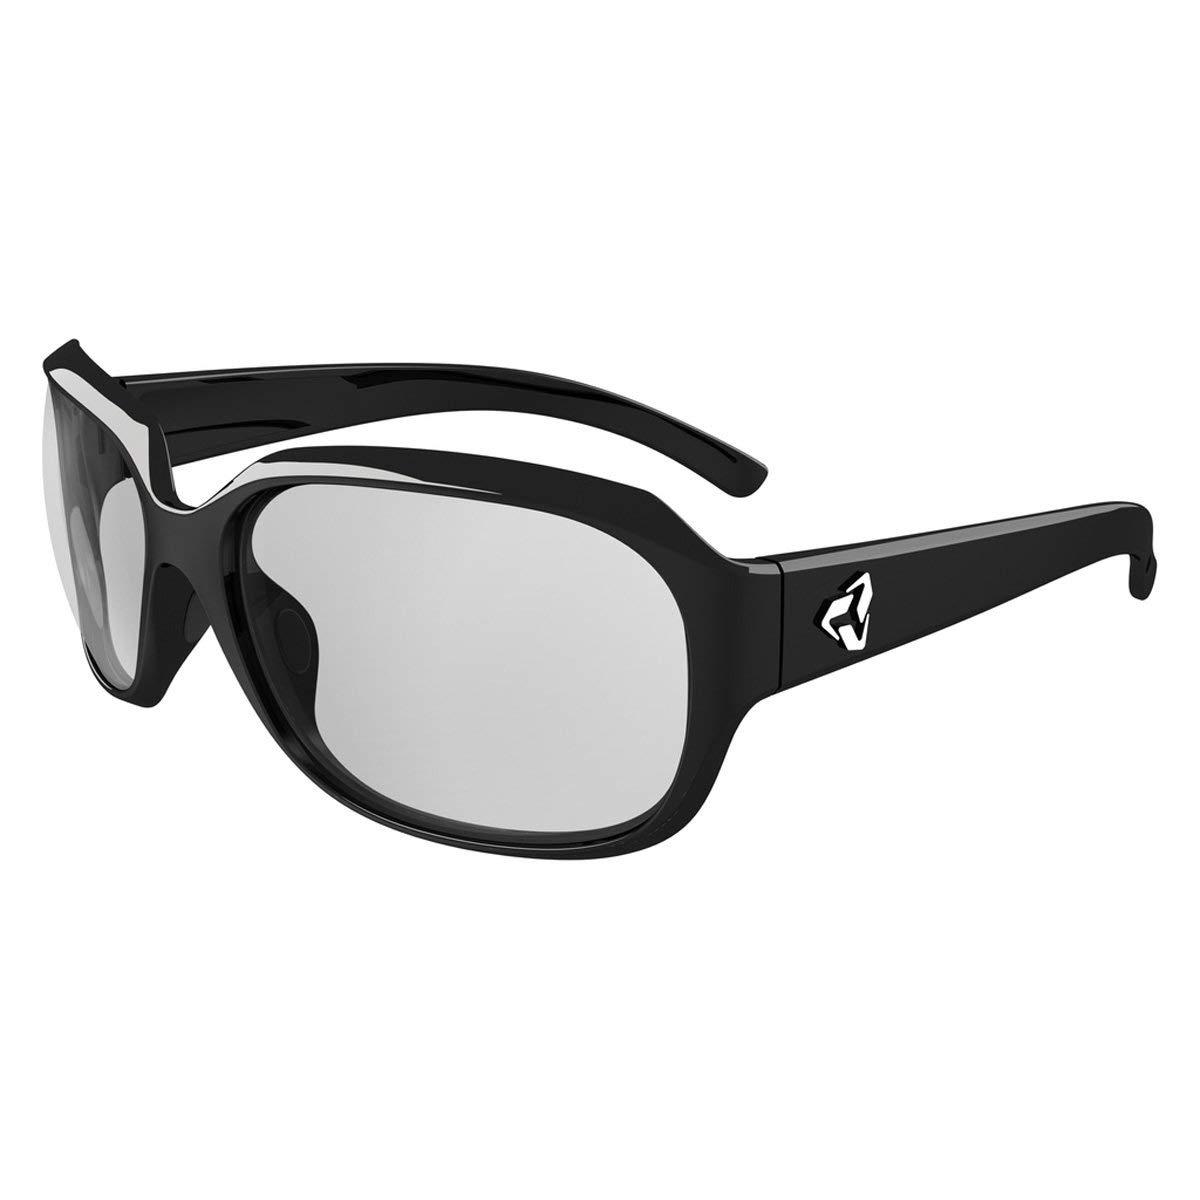 e0481b25da Ryders Eyewear KIRA Women s Cycling Sunglasses with Grey Photochromic Tint  Changing Lenses